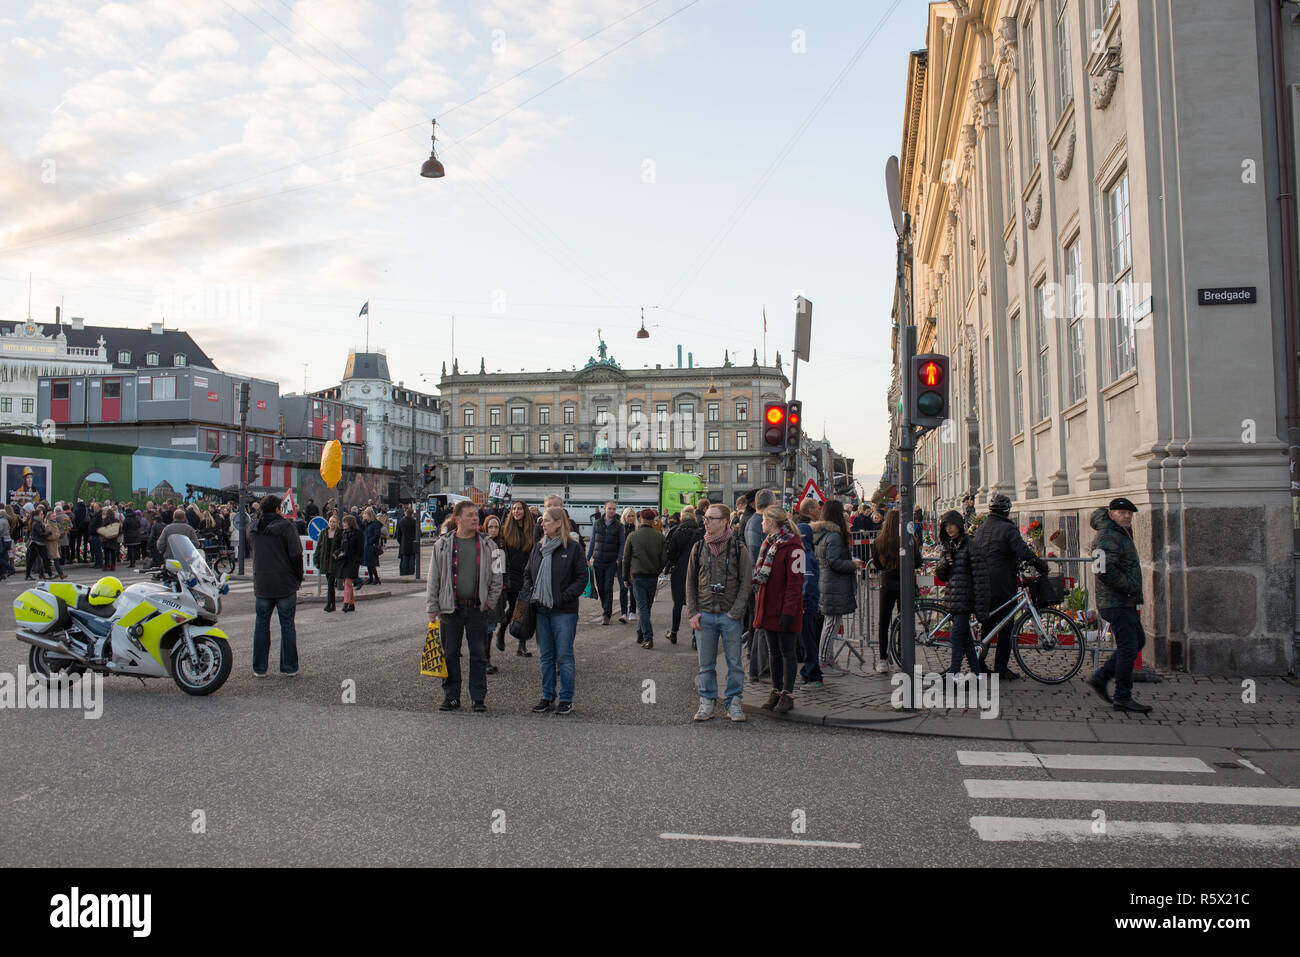 The Embassy of France in Copenhagen after the November 2015 shootings in Copenhagen - Stock Image